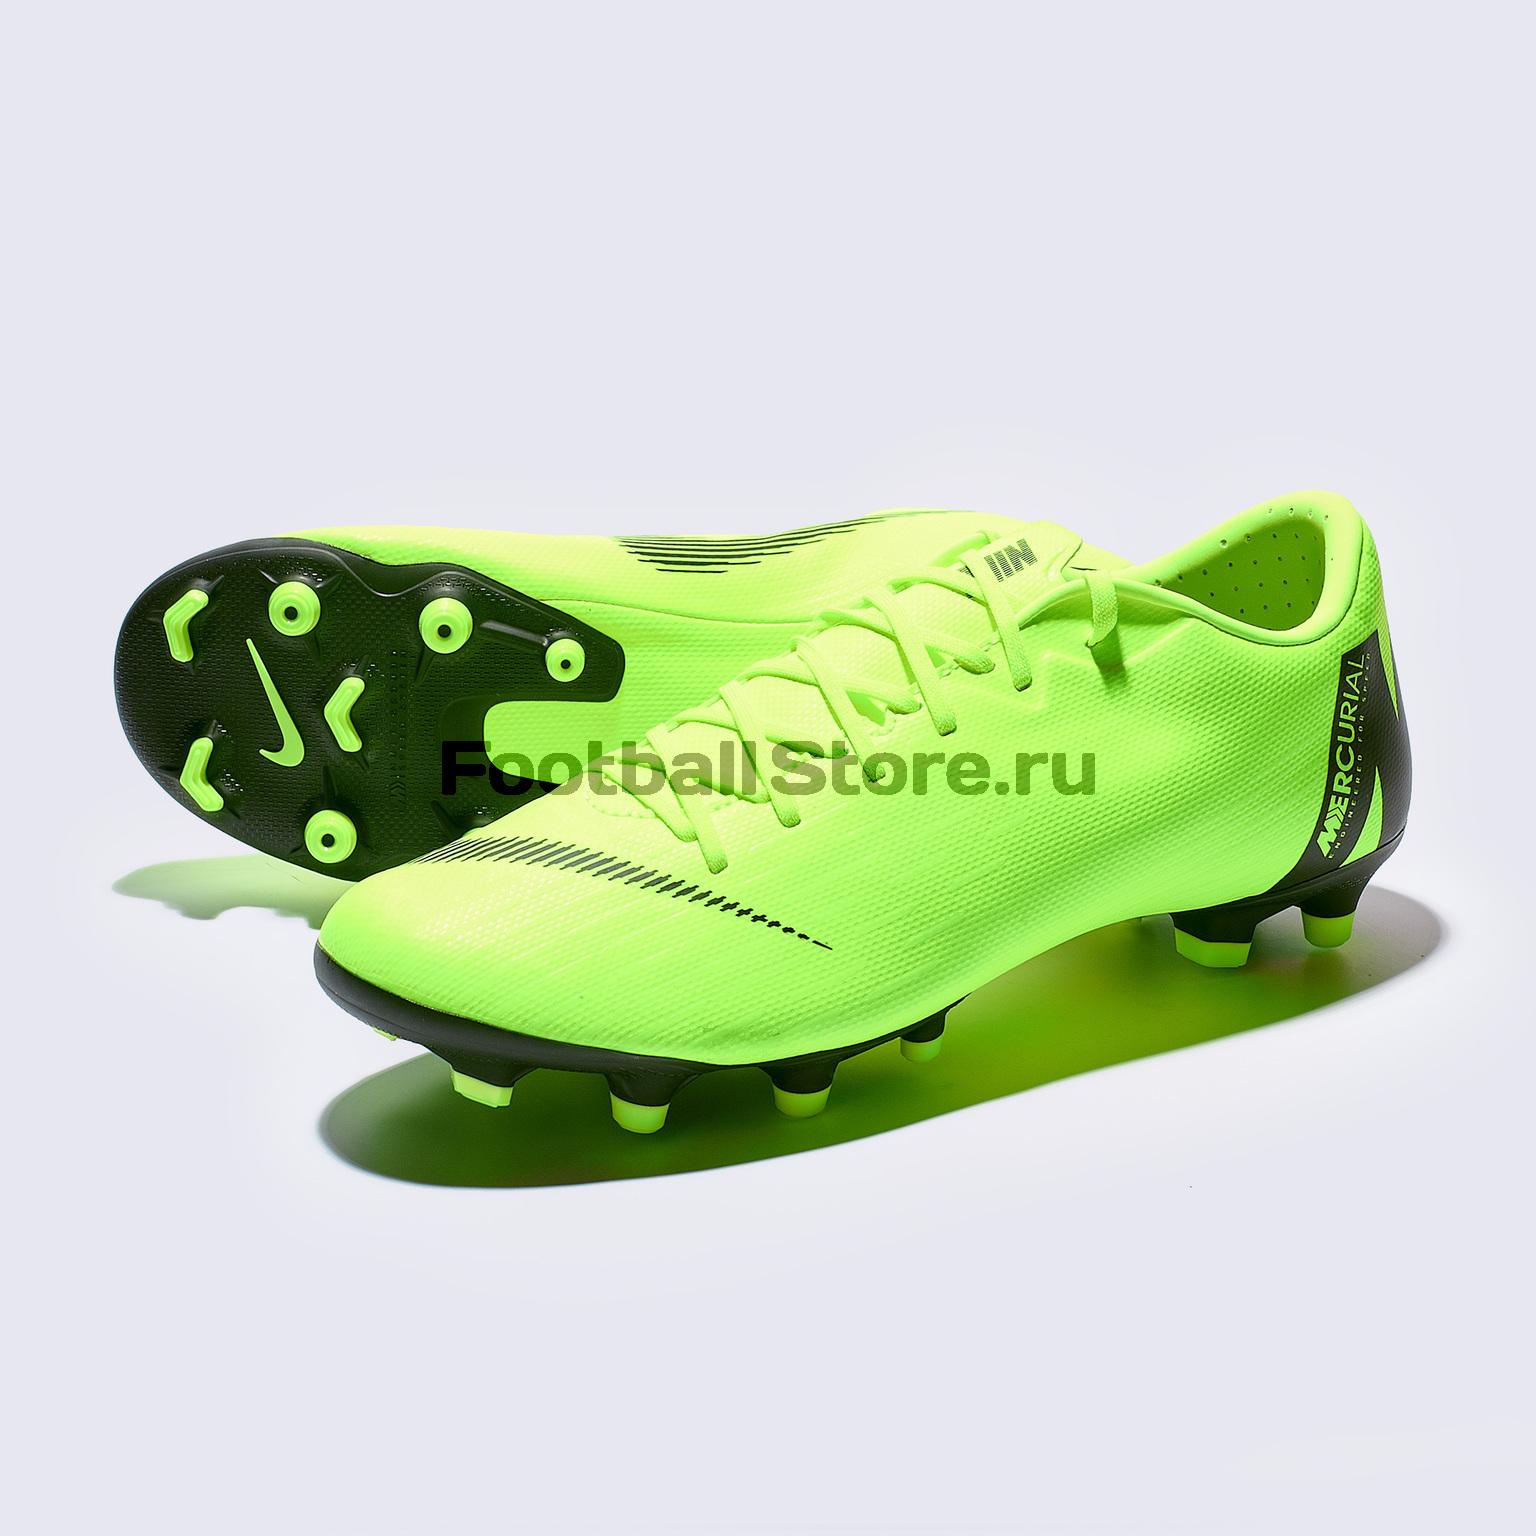 Бутсы Nike Vapor 12 Academy FG/MG AH7375-701